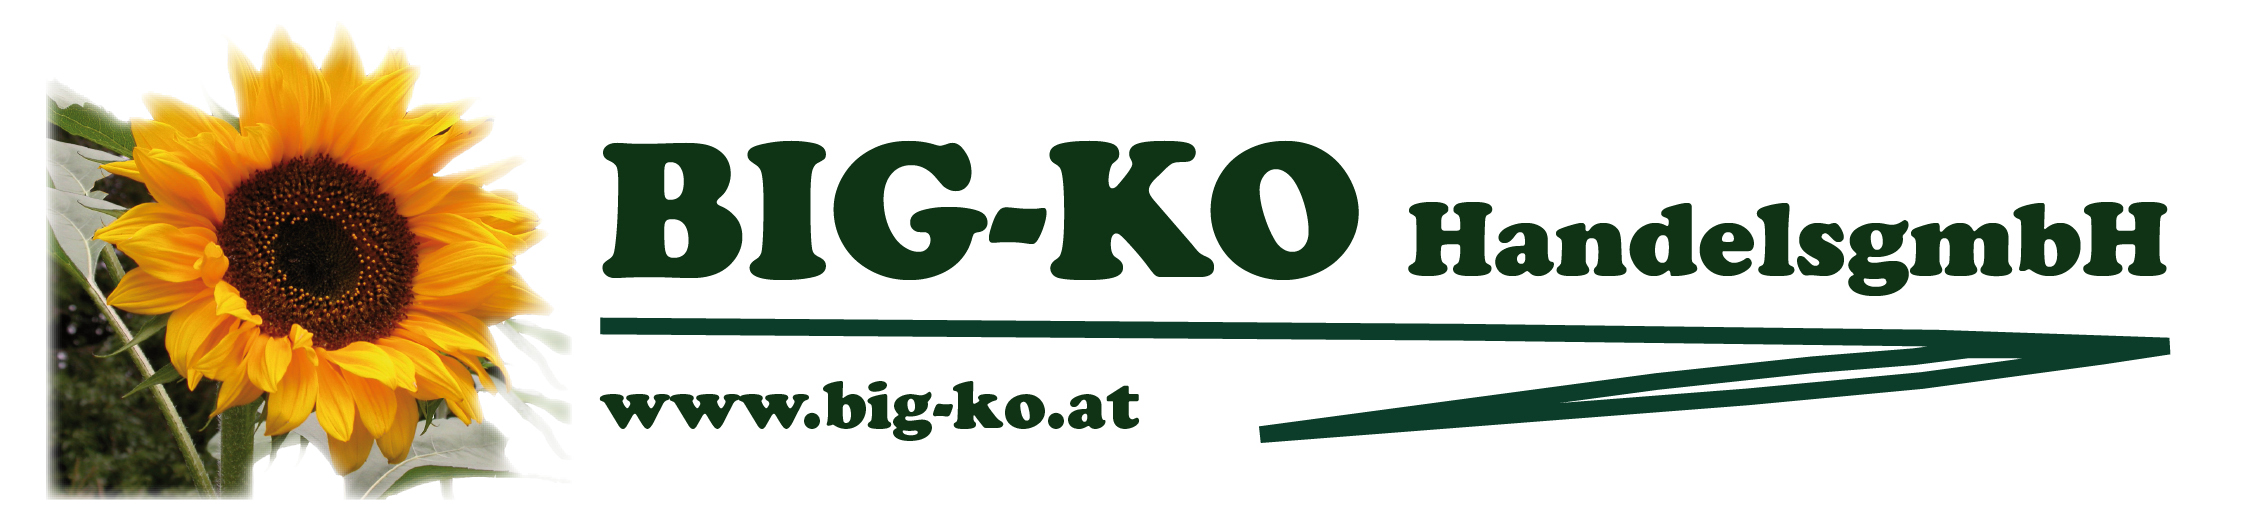 BIG-KO HandelsgmbH